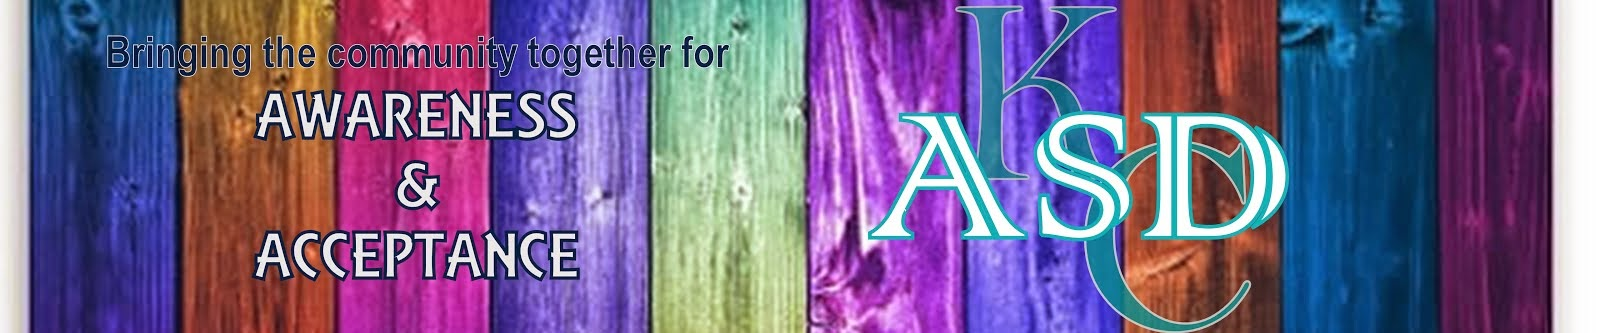 ASD KC (Autism Spectrum Disorders - Kansas City)